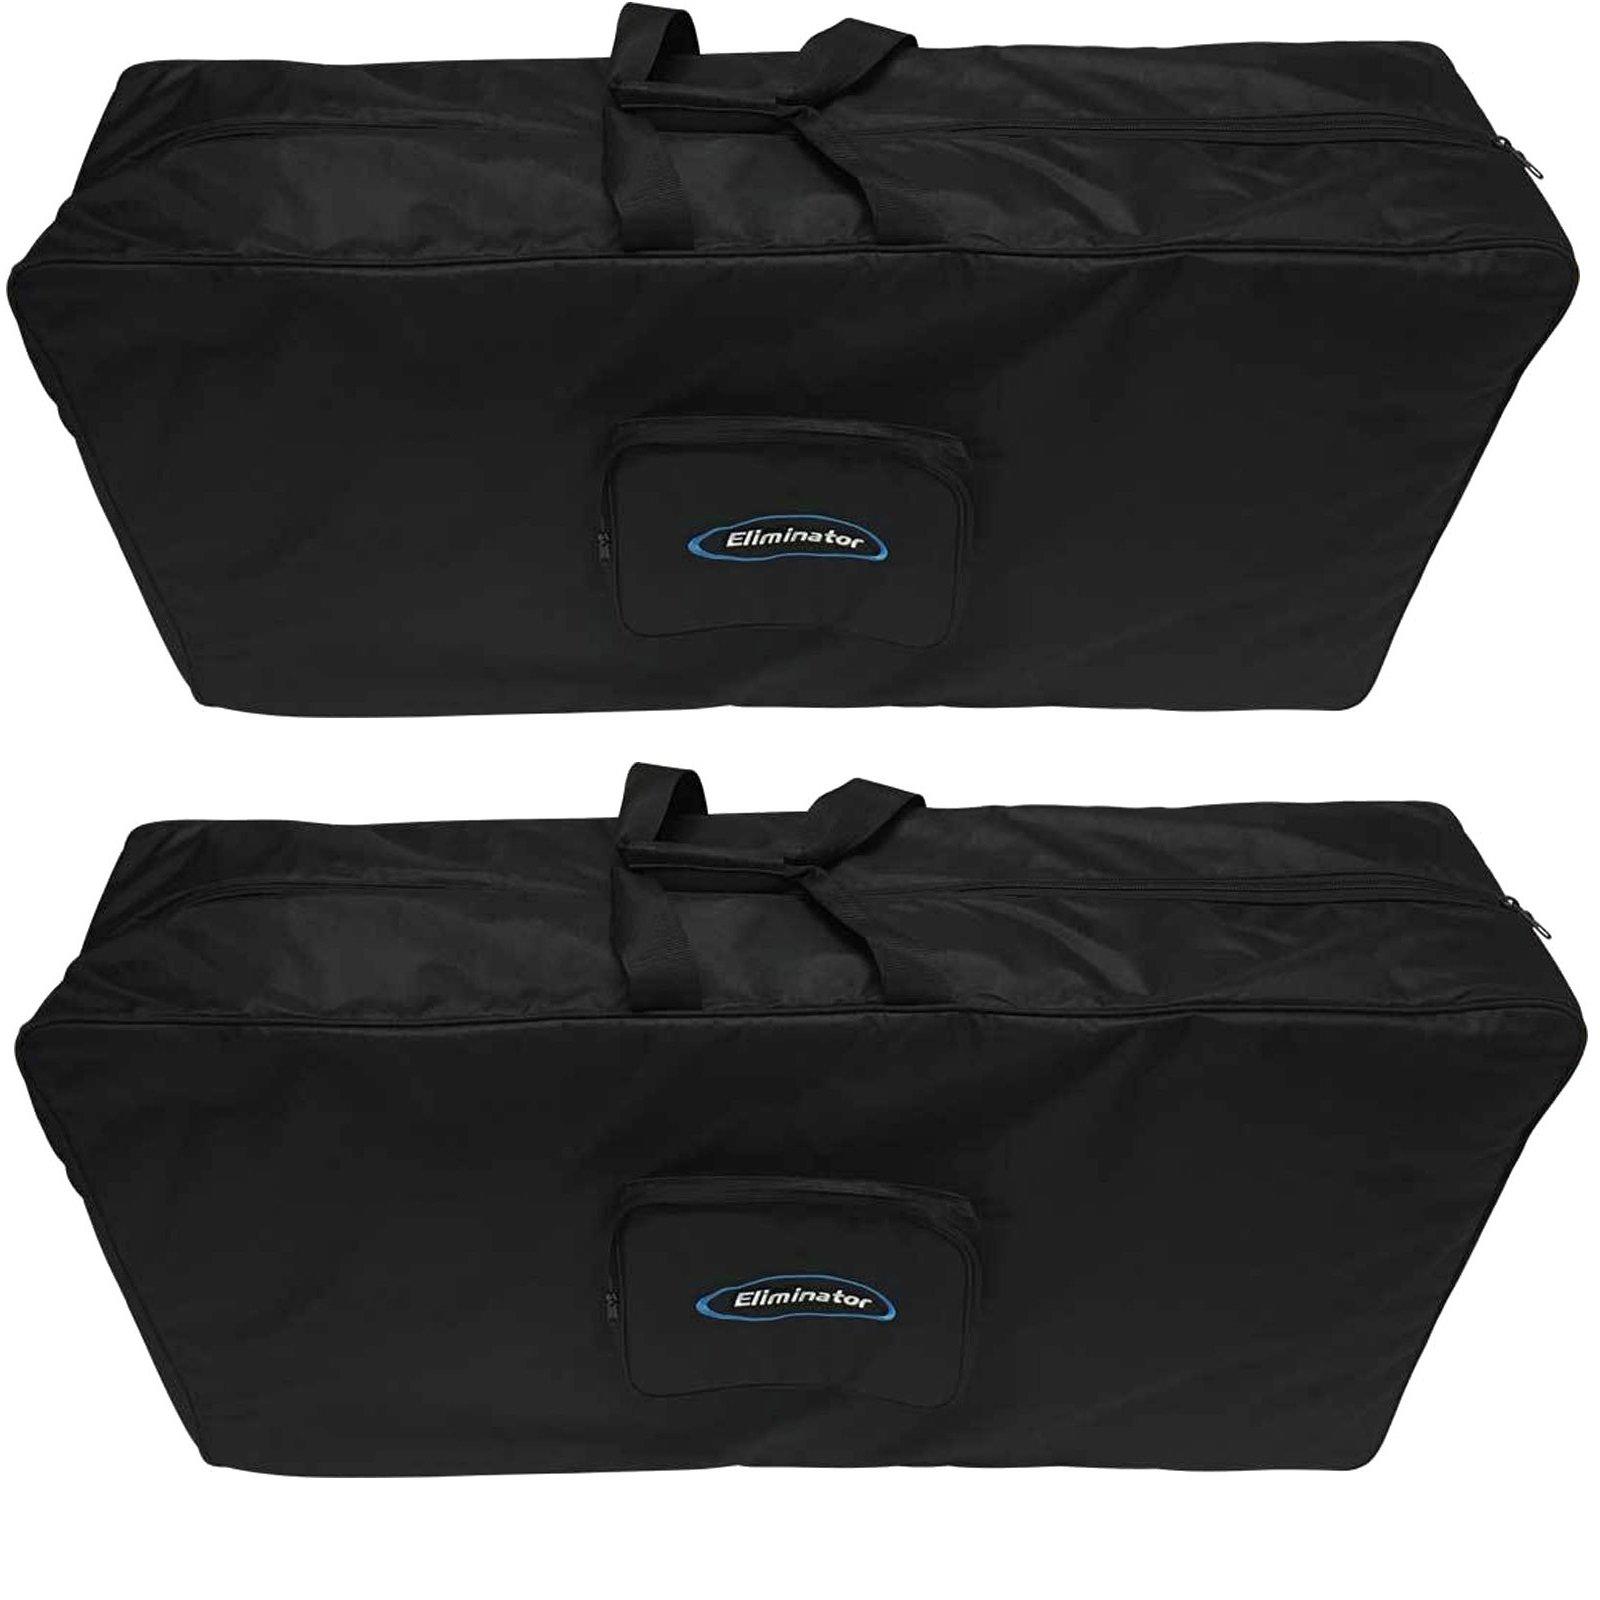 eliminator-decor-bag-pair.jpg